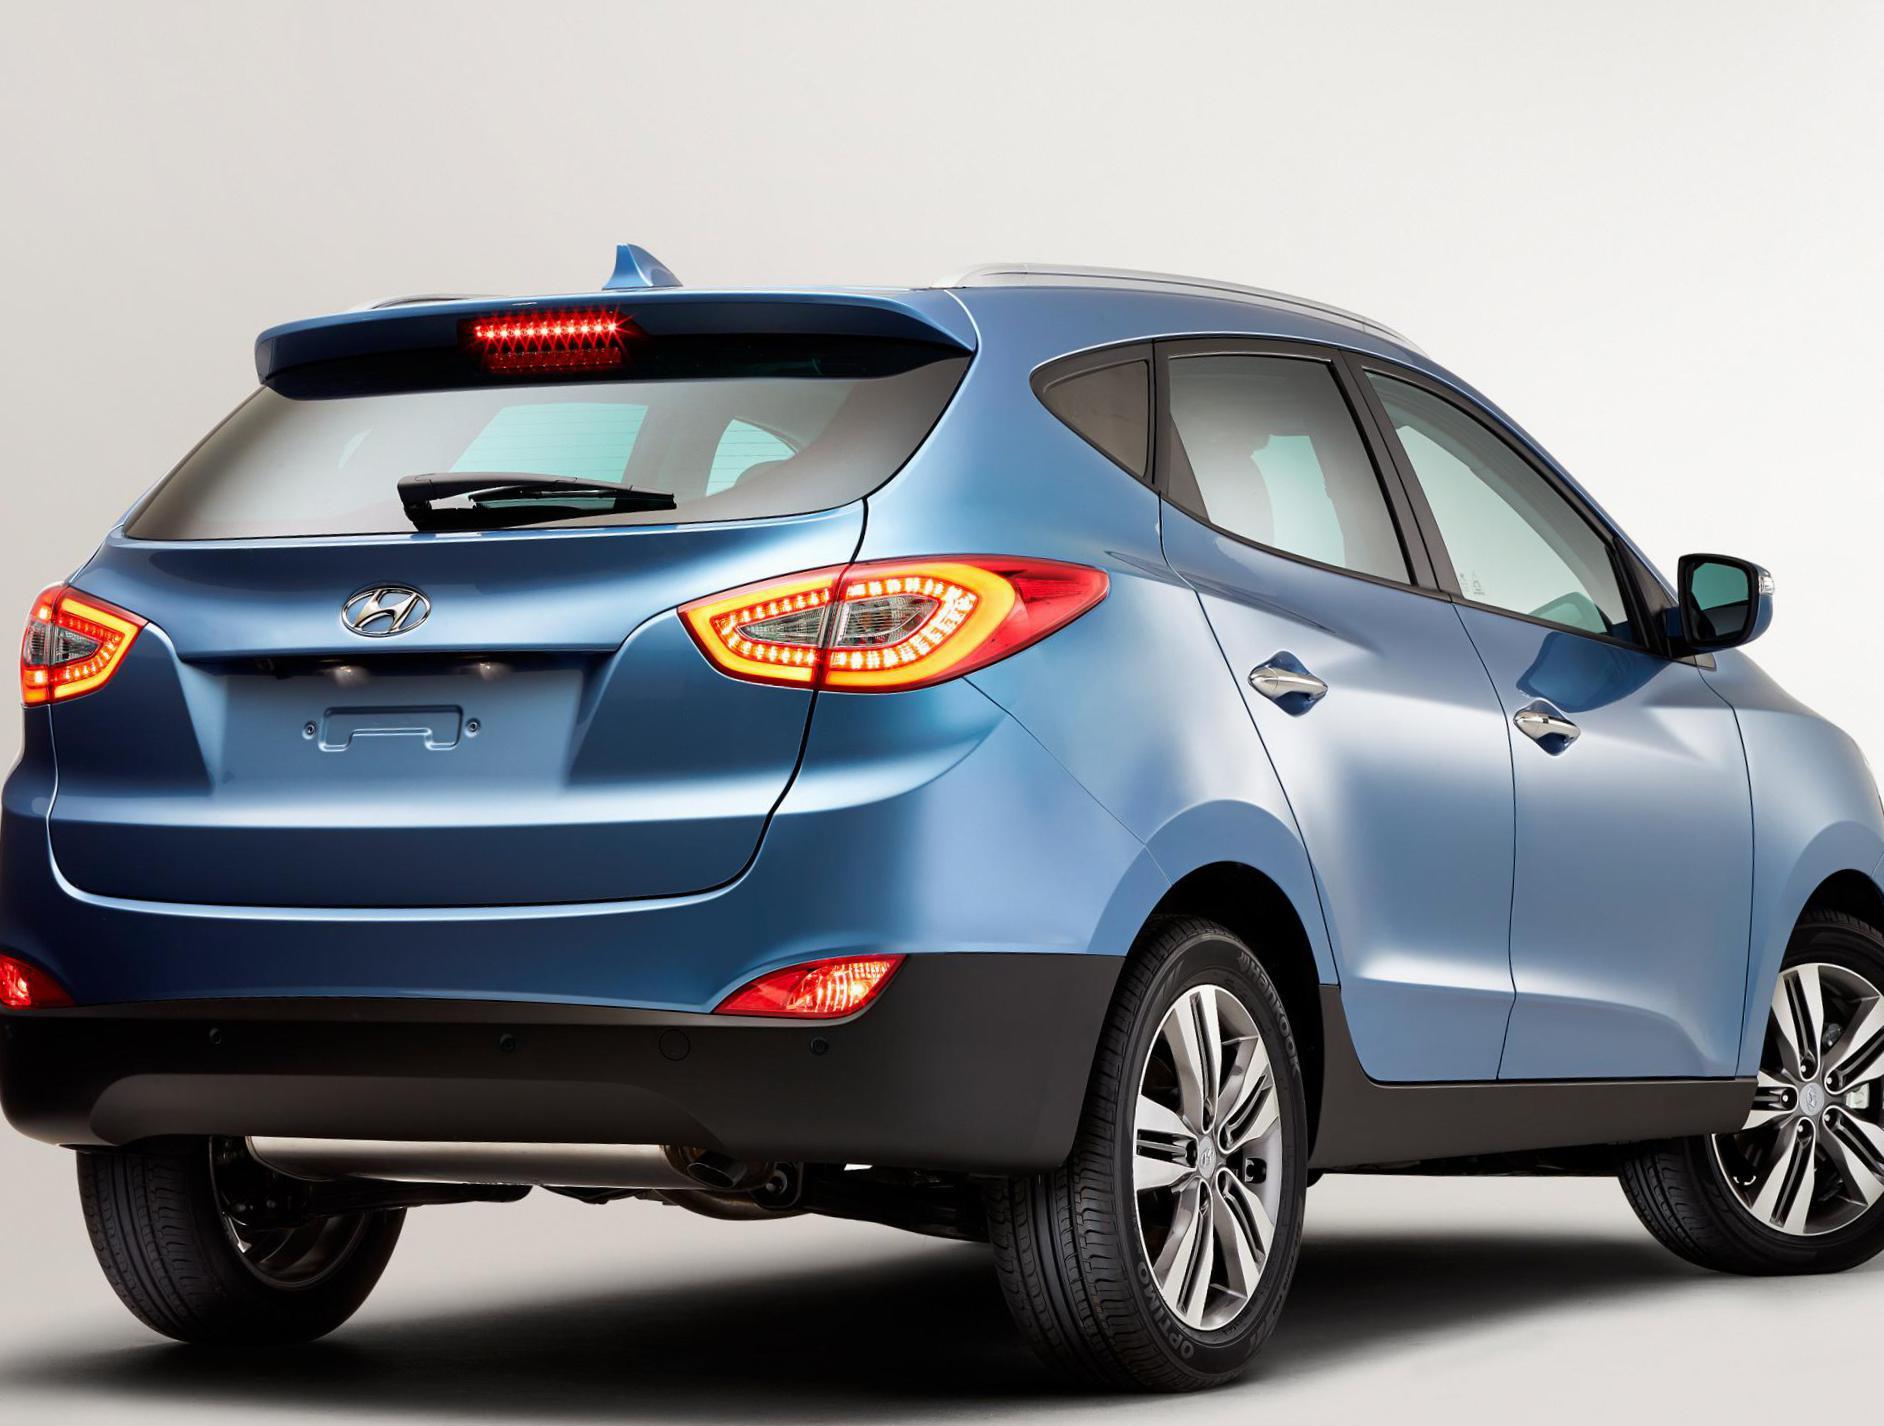 Hyundai ix35: specifications and model description